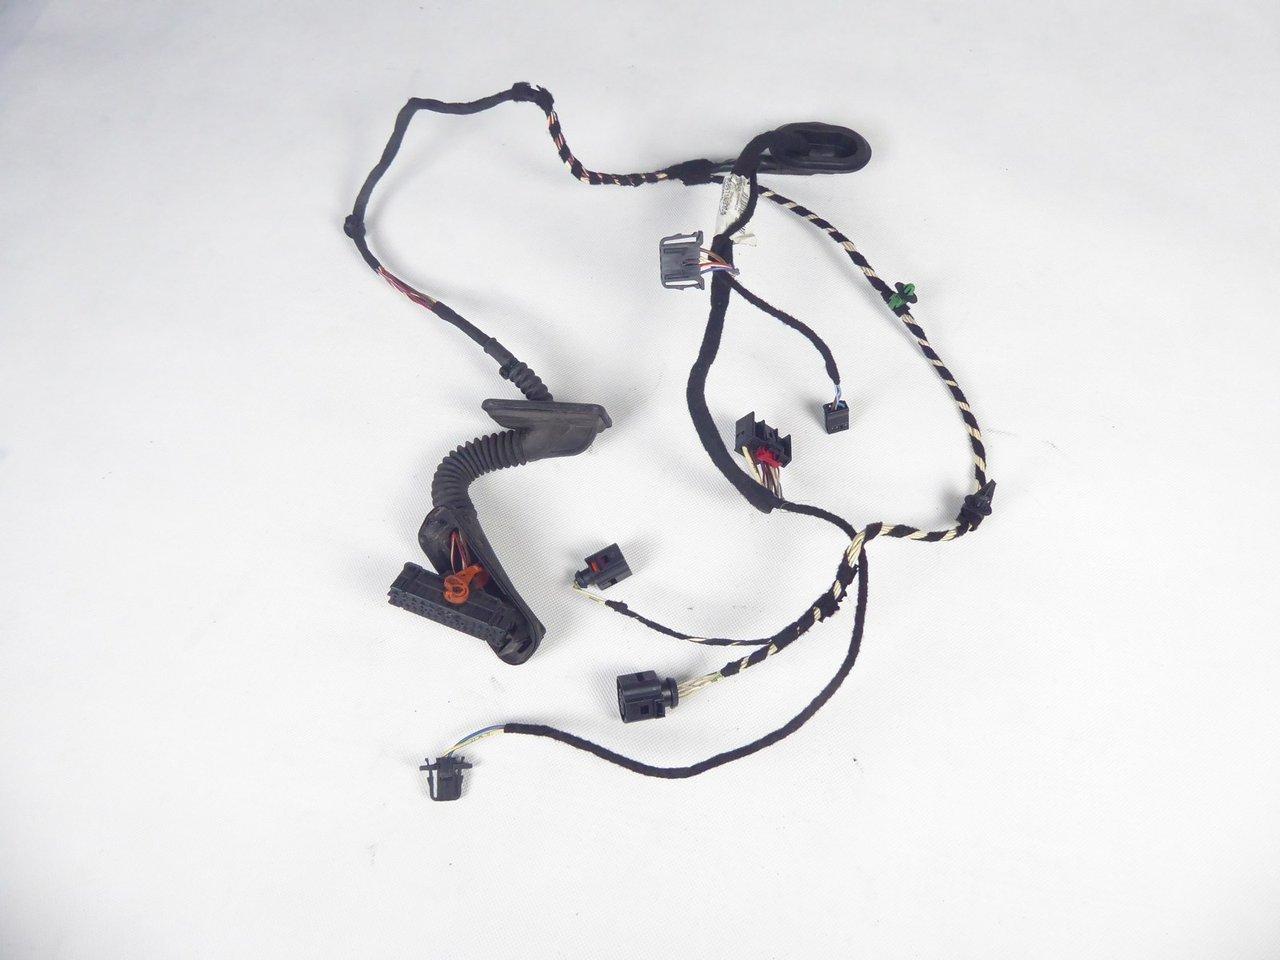 Wiring Harness Set For Door Vw Passat Cc 3c8971693dm 9 Phaeton